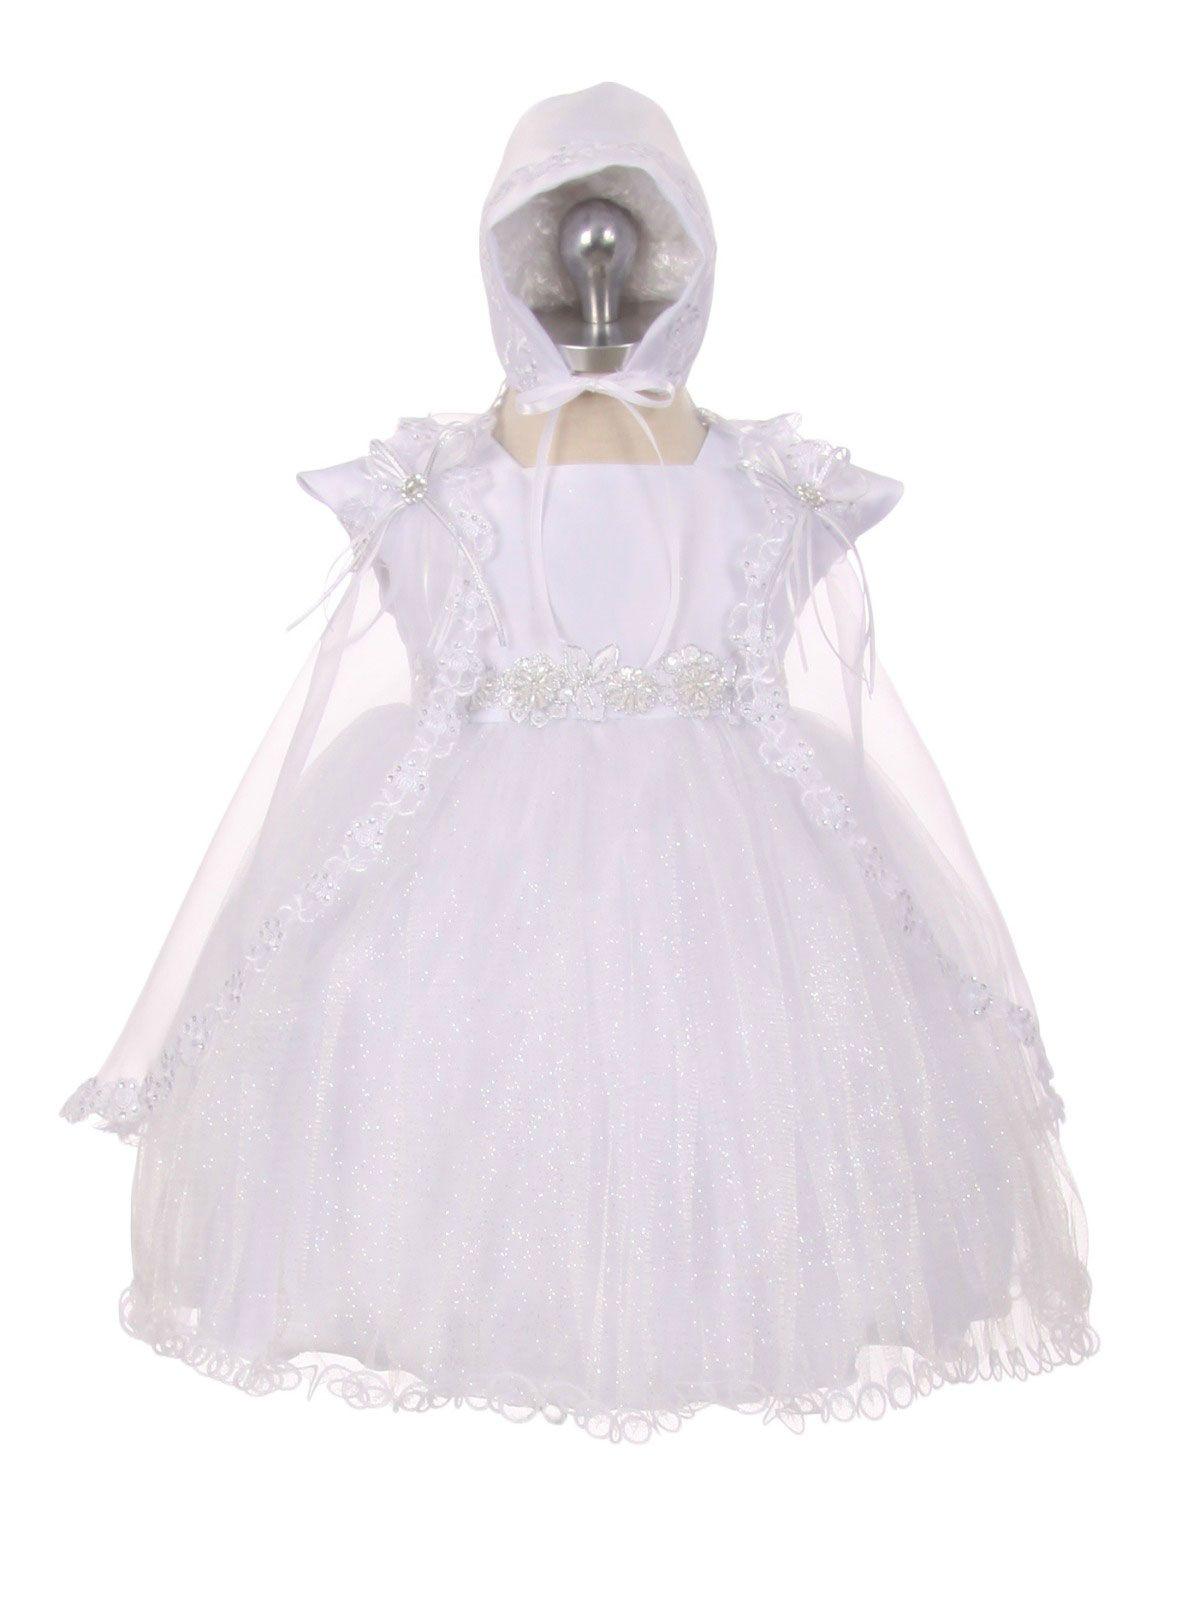 Girls Baptism-Christening Gown Style 018 - WHITE Cap Sleeve Satin ...